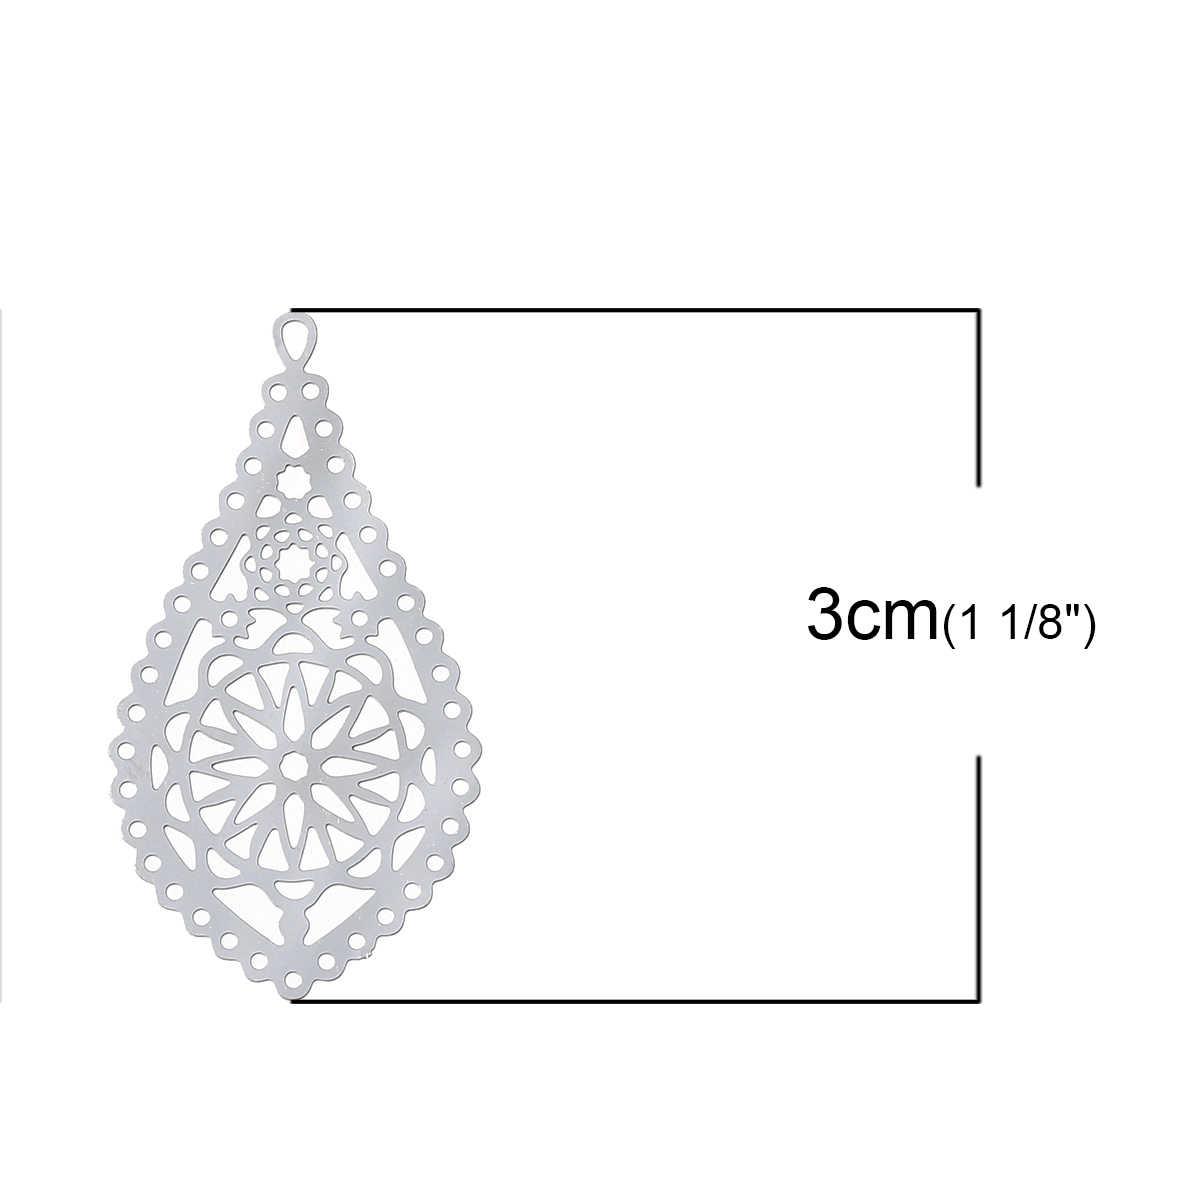 "DoreenBeads פיליגרן נירוסטה קסם תליוני Teardrop כסף טון פרח חלול מגולף 30 מ""מ (1 1/8 "") x 16 מ""מ (5/8 ""), 2 יחידות"